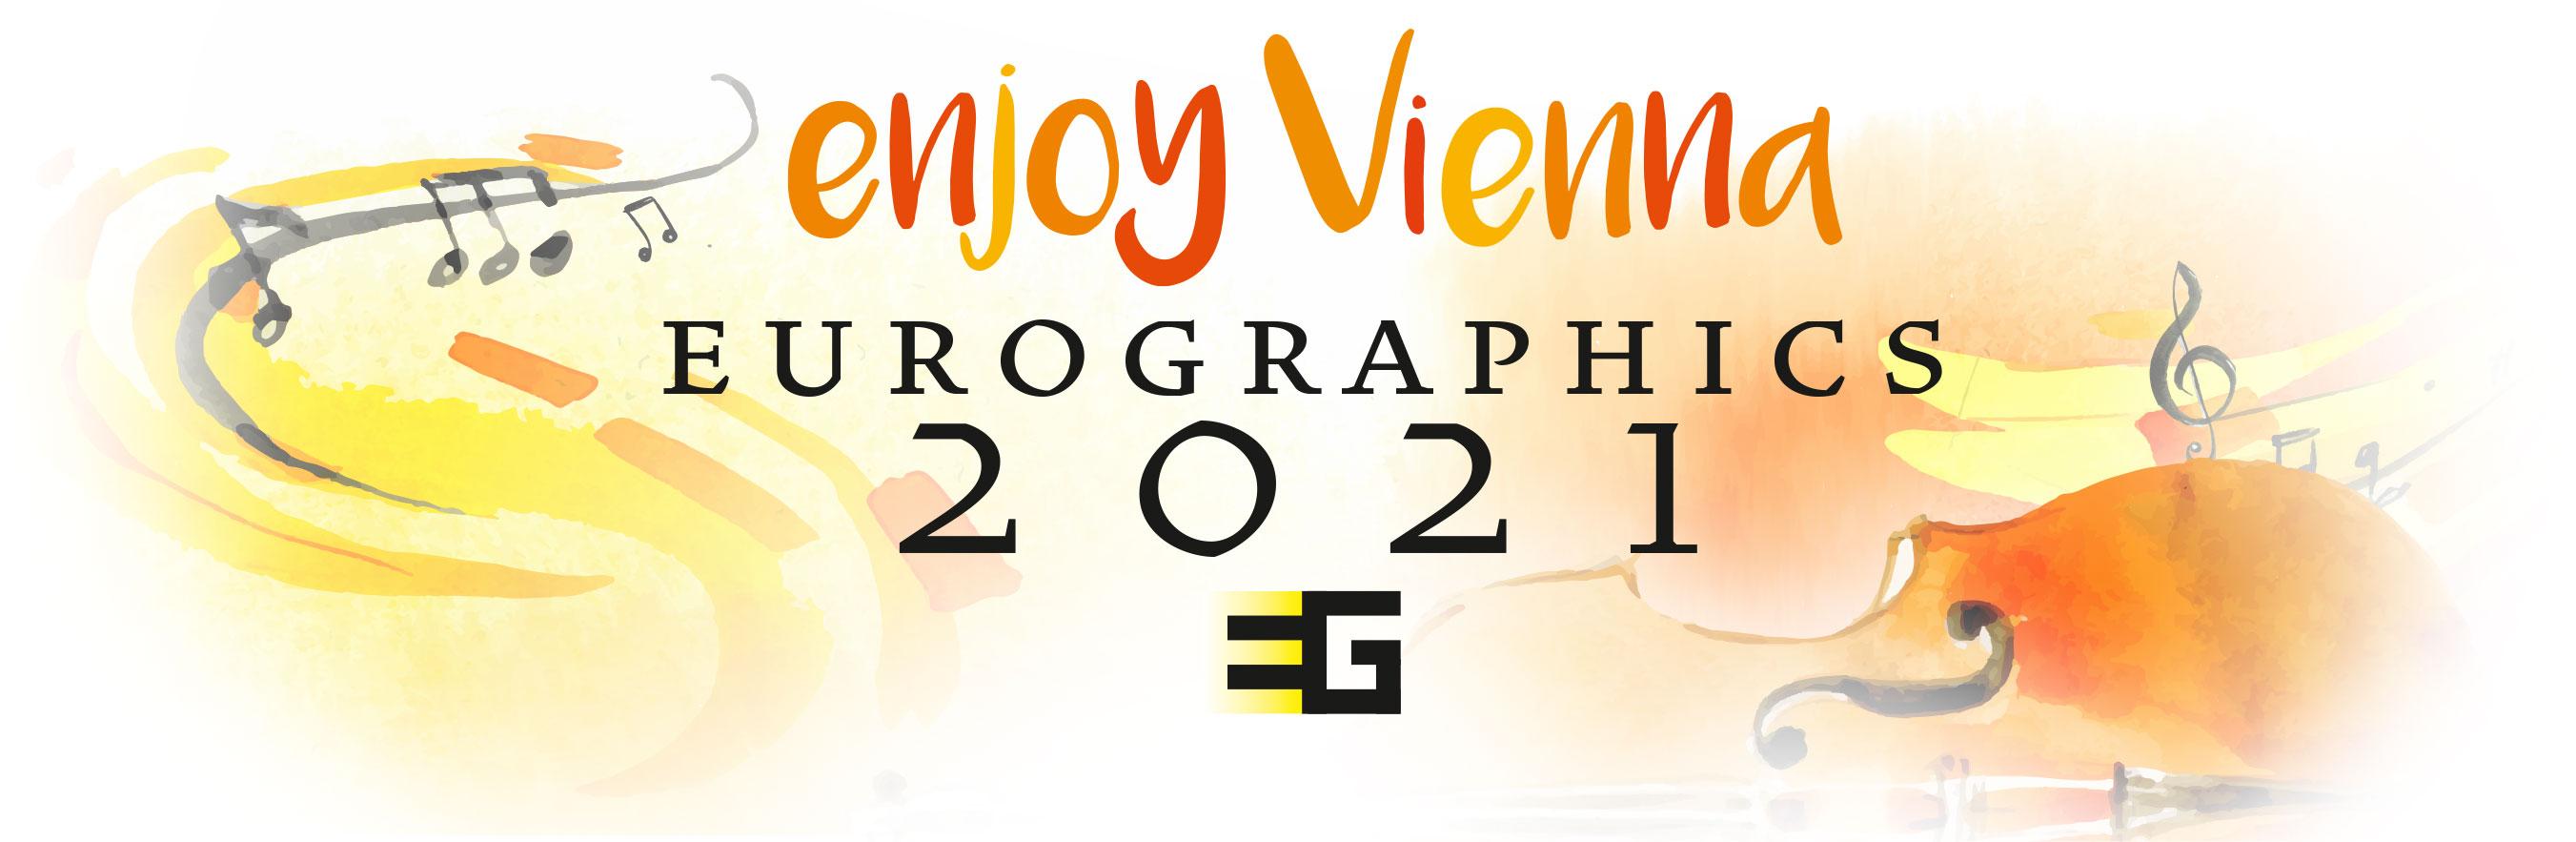 Eurographics'2021